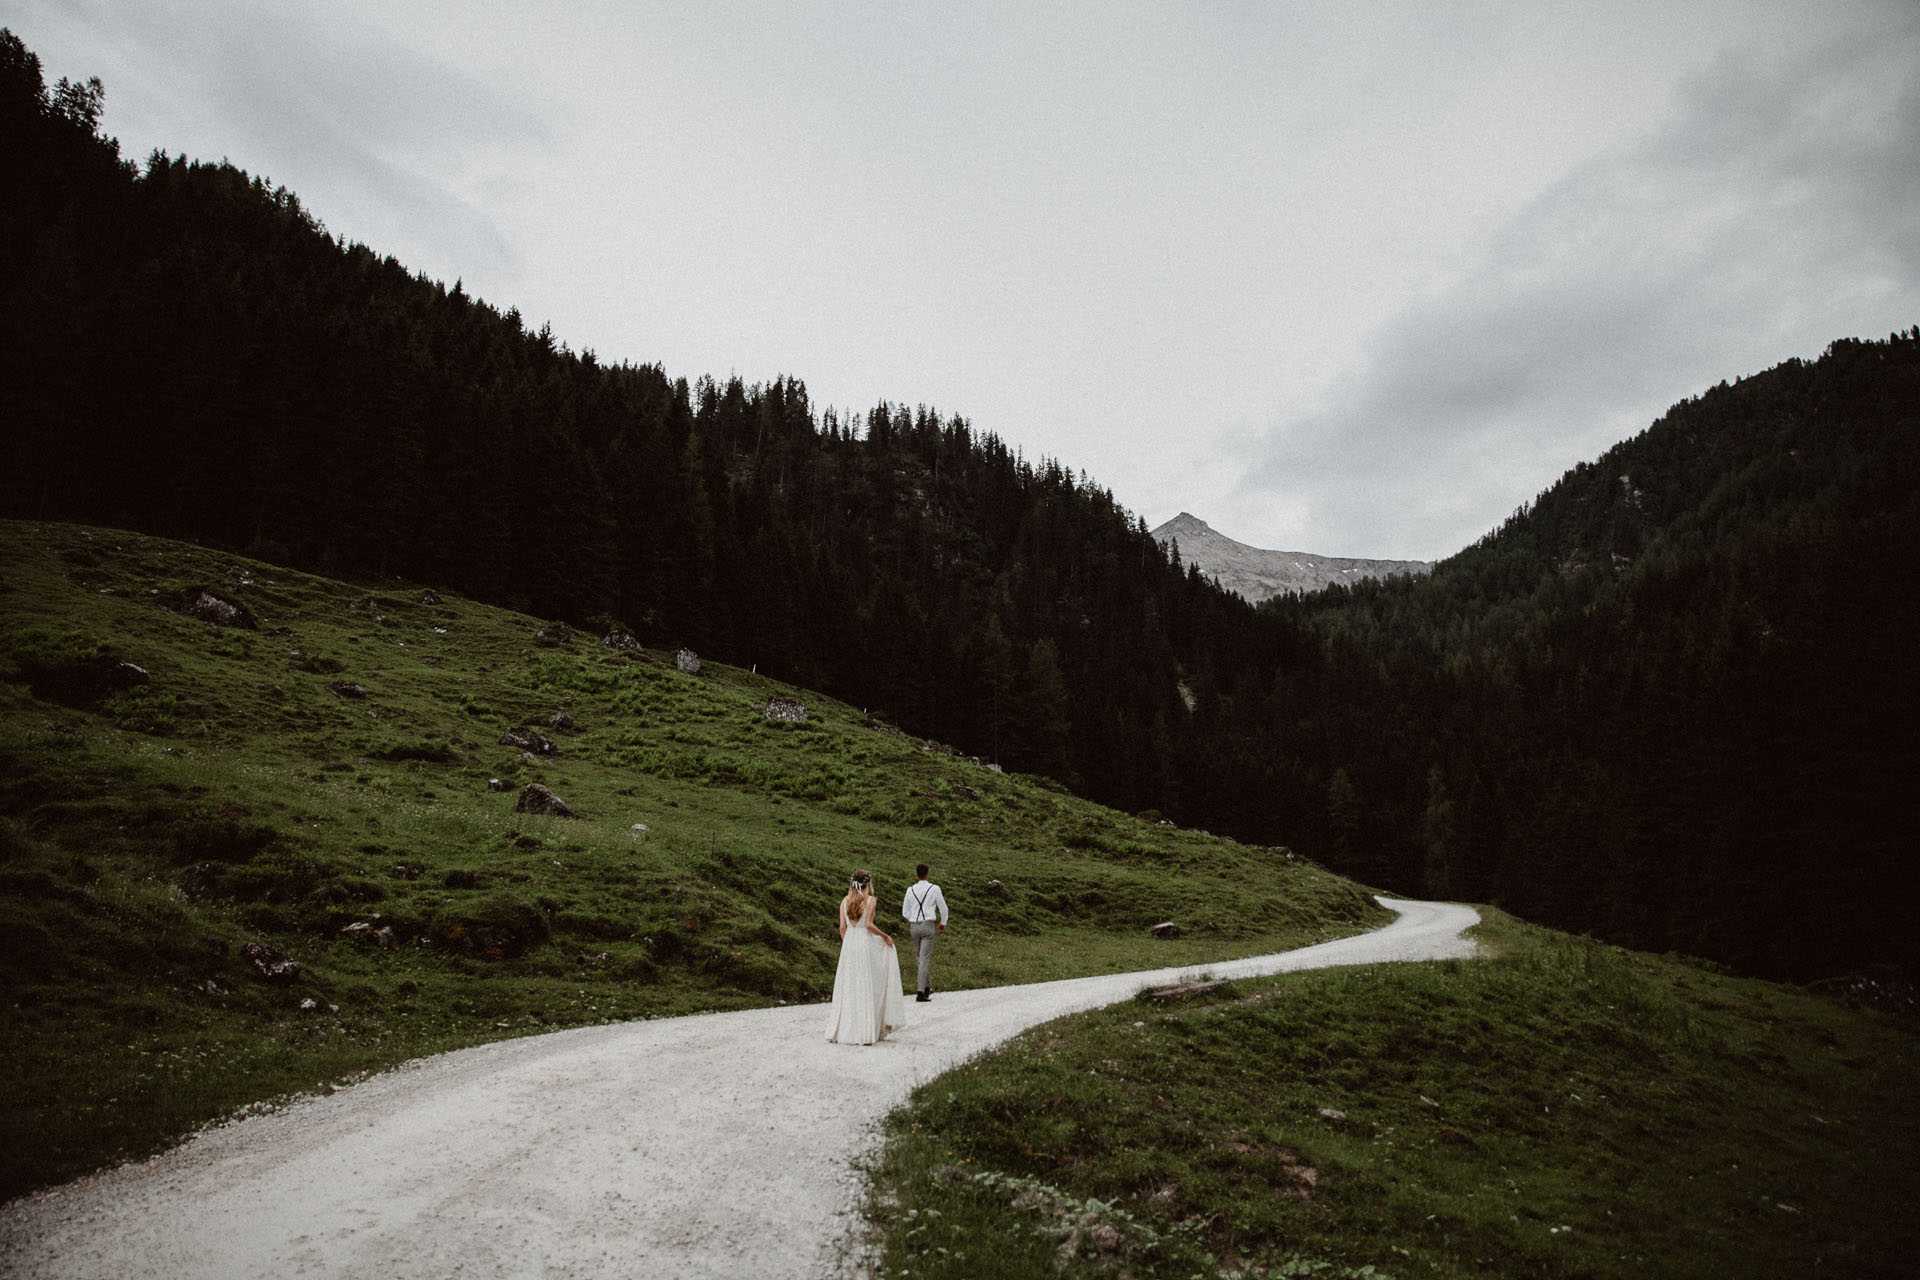 vienna-wedding-photographer-agnesundandi-weddingshooting-schladming-231